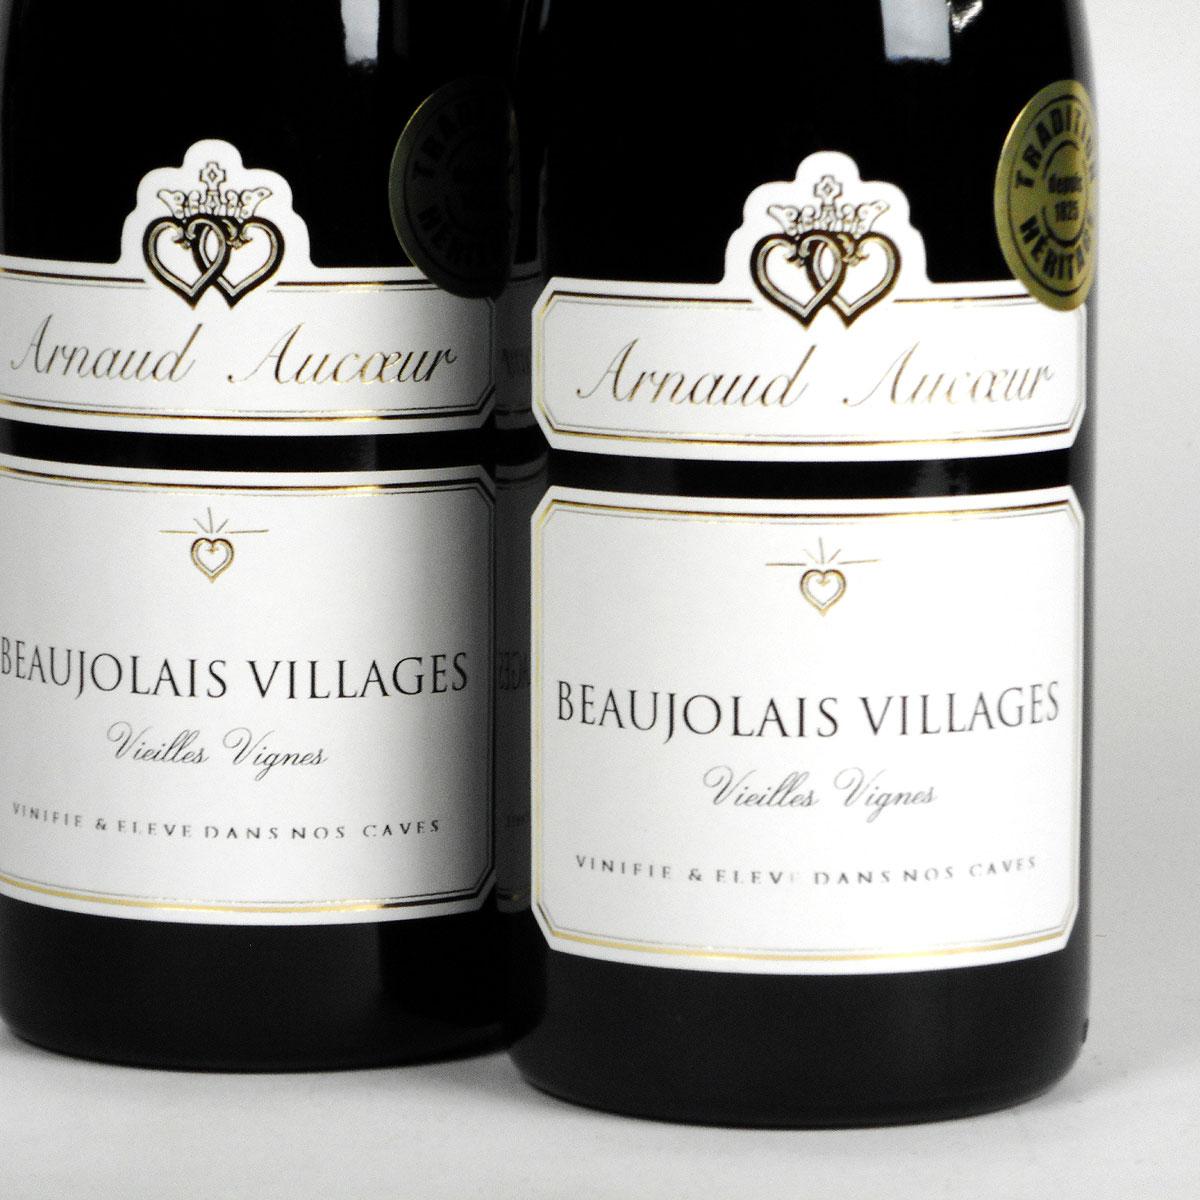 Beaujolais Villages: Arnaud Aucoeur 'Vieilles Vignes' 2018